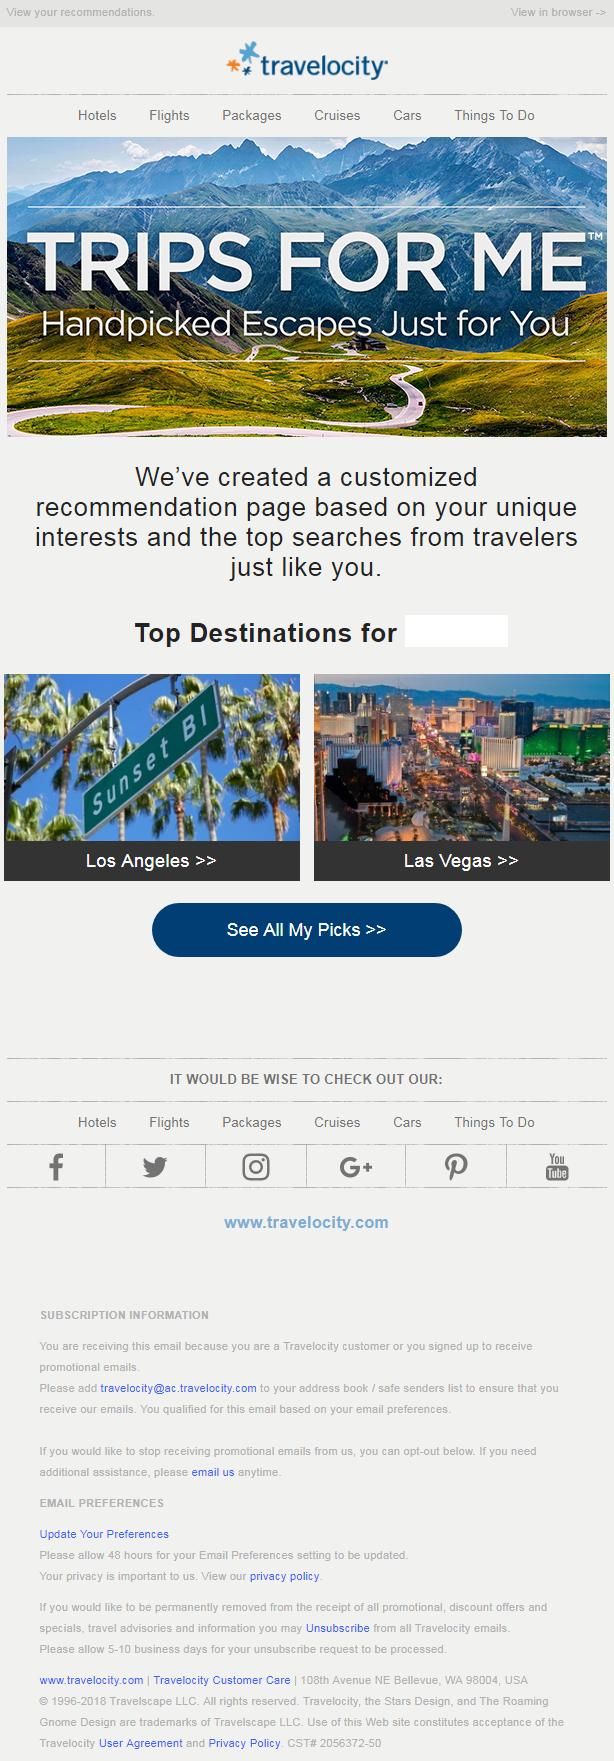 Travelocity Social Media